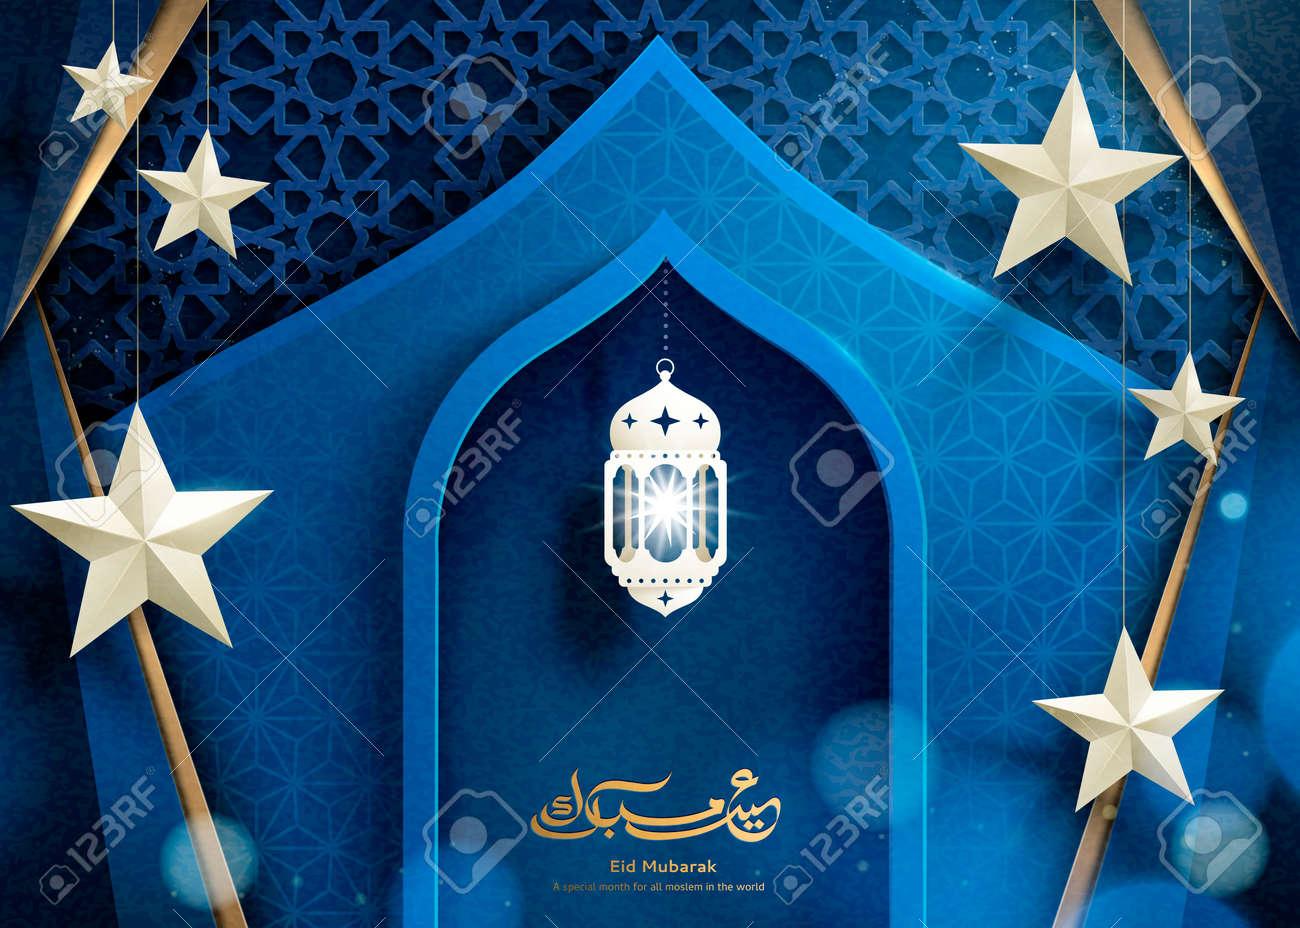 Eid Mubarak calligraphy design with lovely hanging stars and lantern on arabesque background, paper art style - 112241758